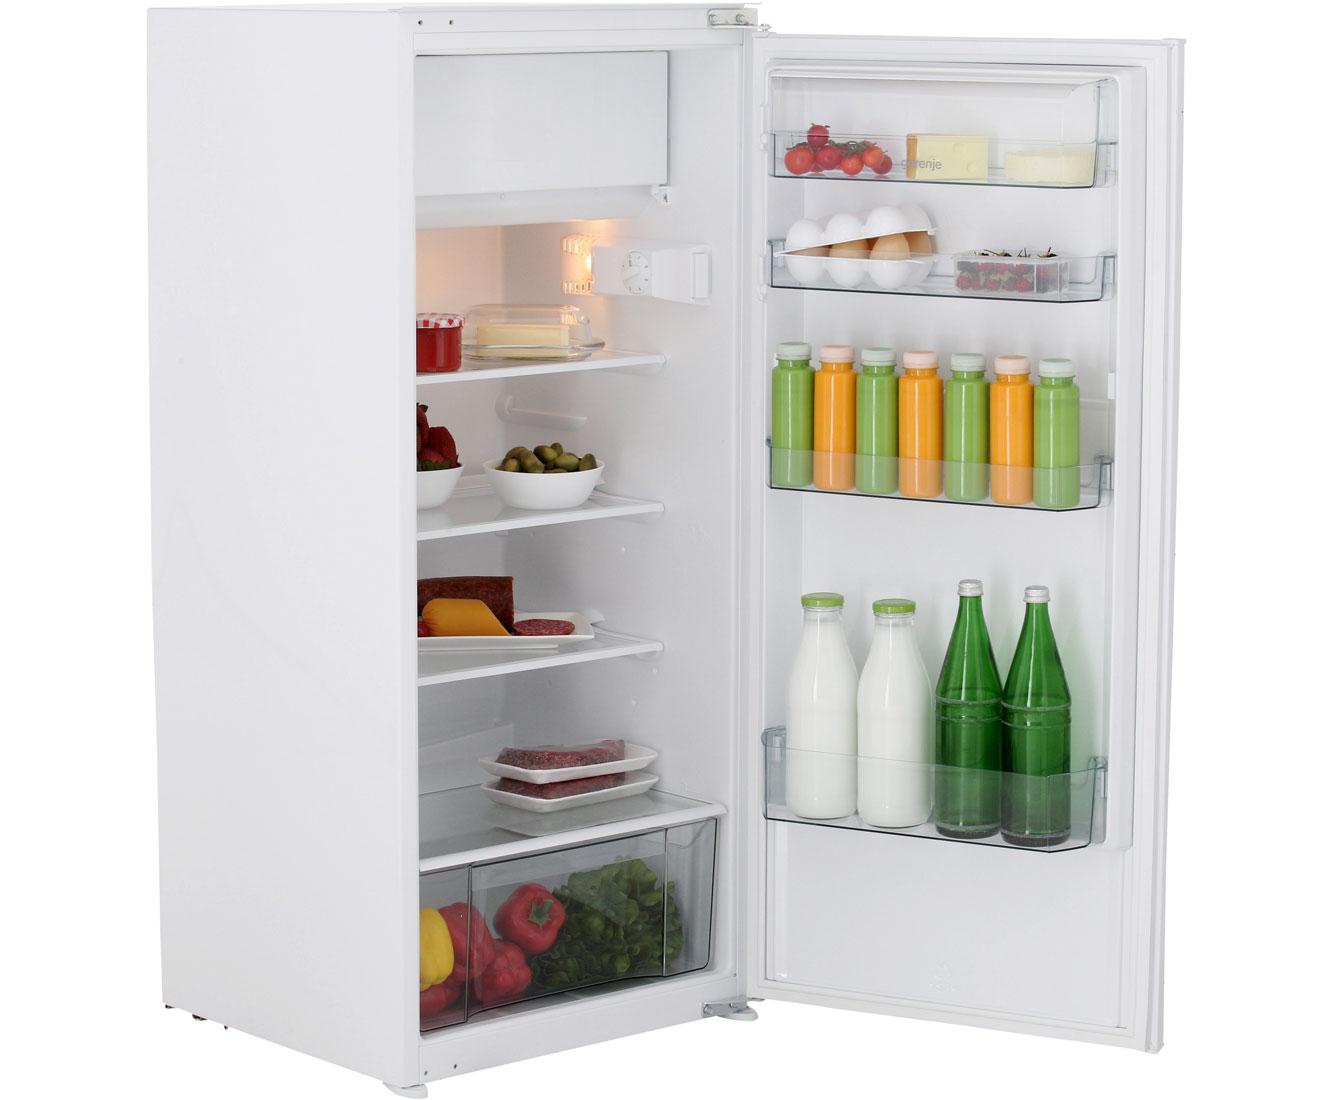 Gorenje RBI4122AW Kühlschränke - Weiß